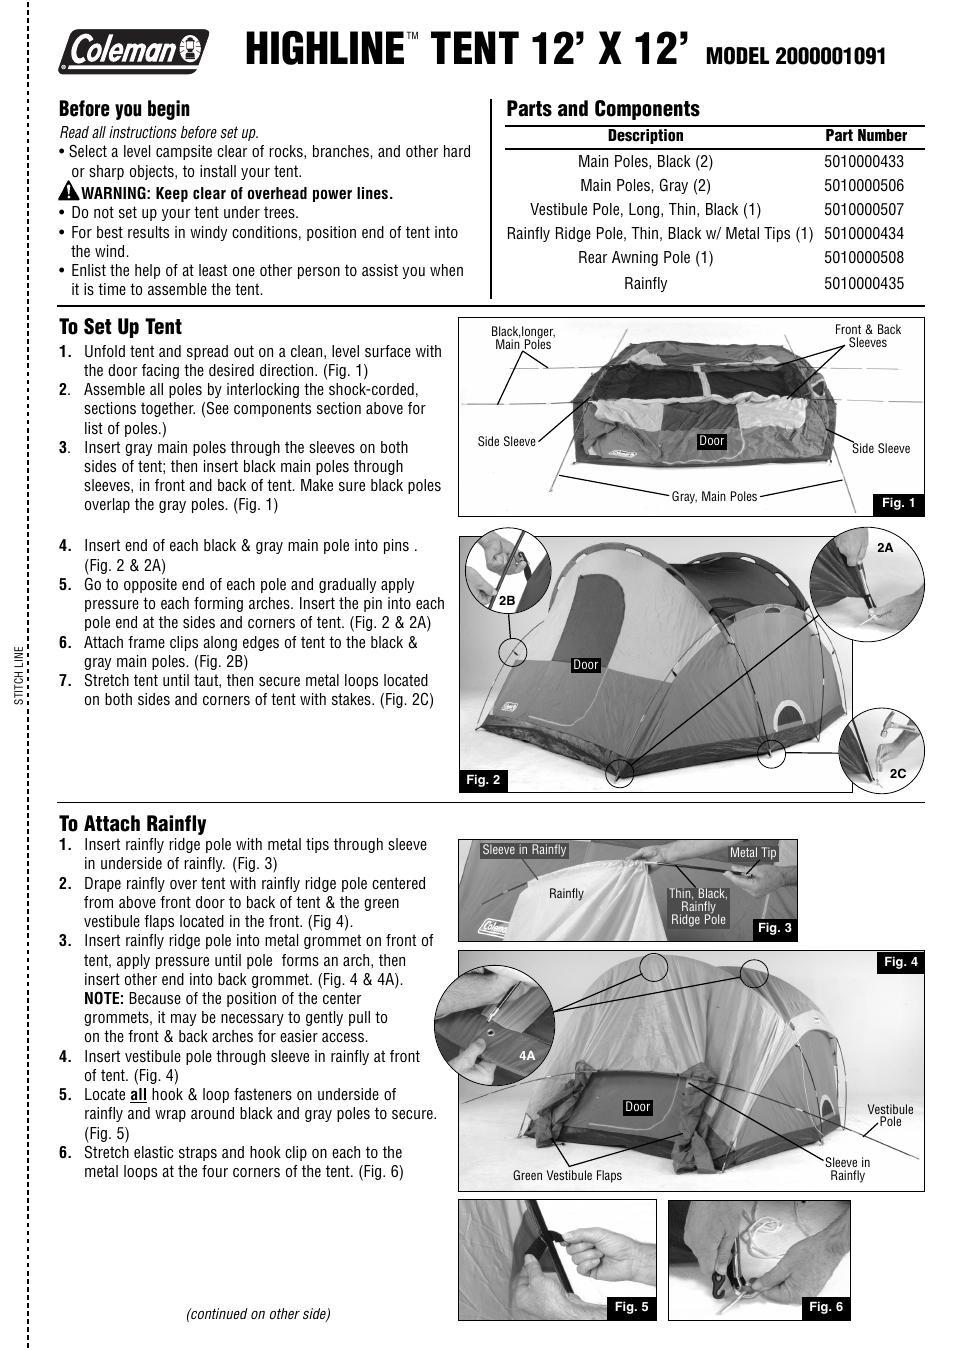 sc 1 st  manualsdir.com & Coleman HIGHLINE 2000001091 User Manual | 2 pages